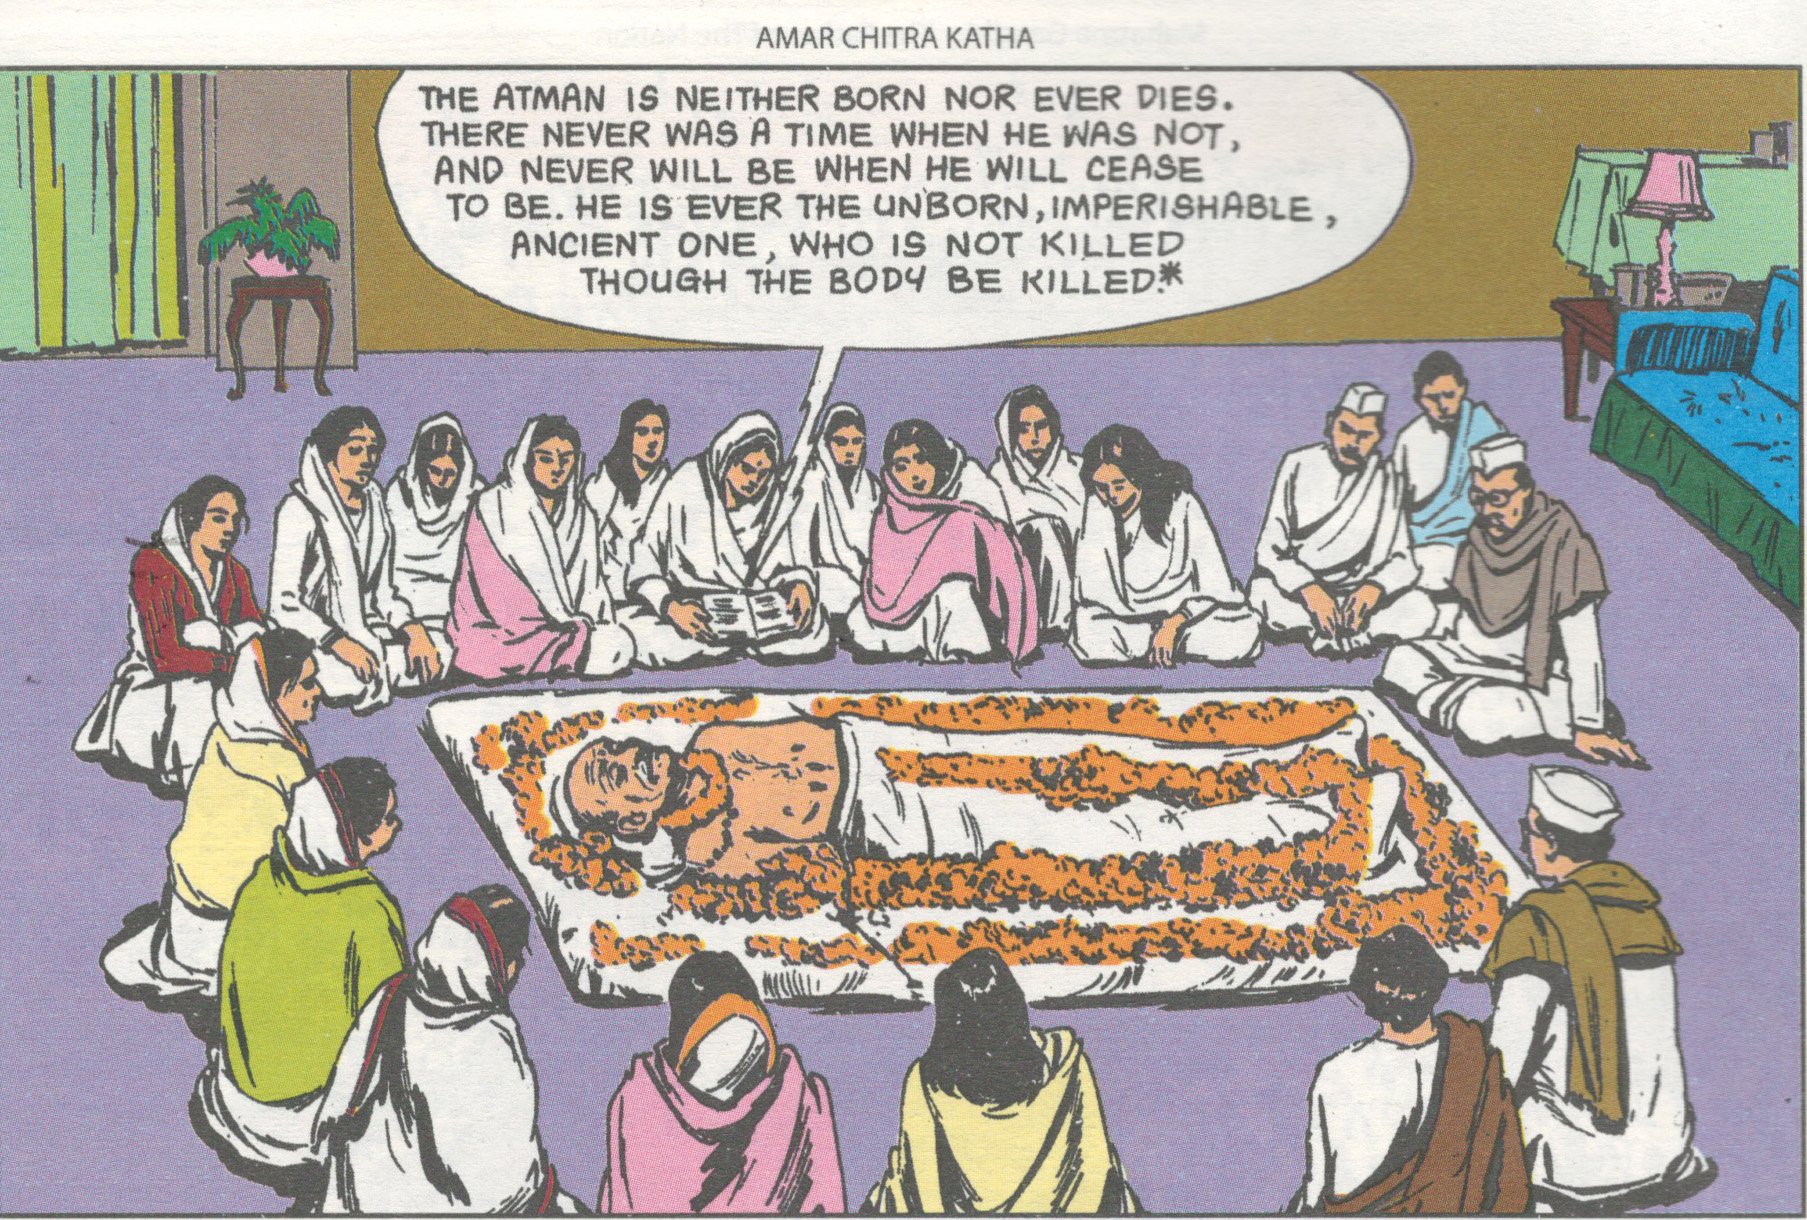 Fig. 6. Sourav Roy, comic book illustration, c. 2008<br />From <em>Mahatma Gandhi: Father of the Nation</em>. Mumbai: Amar Chitra Katha, 2008